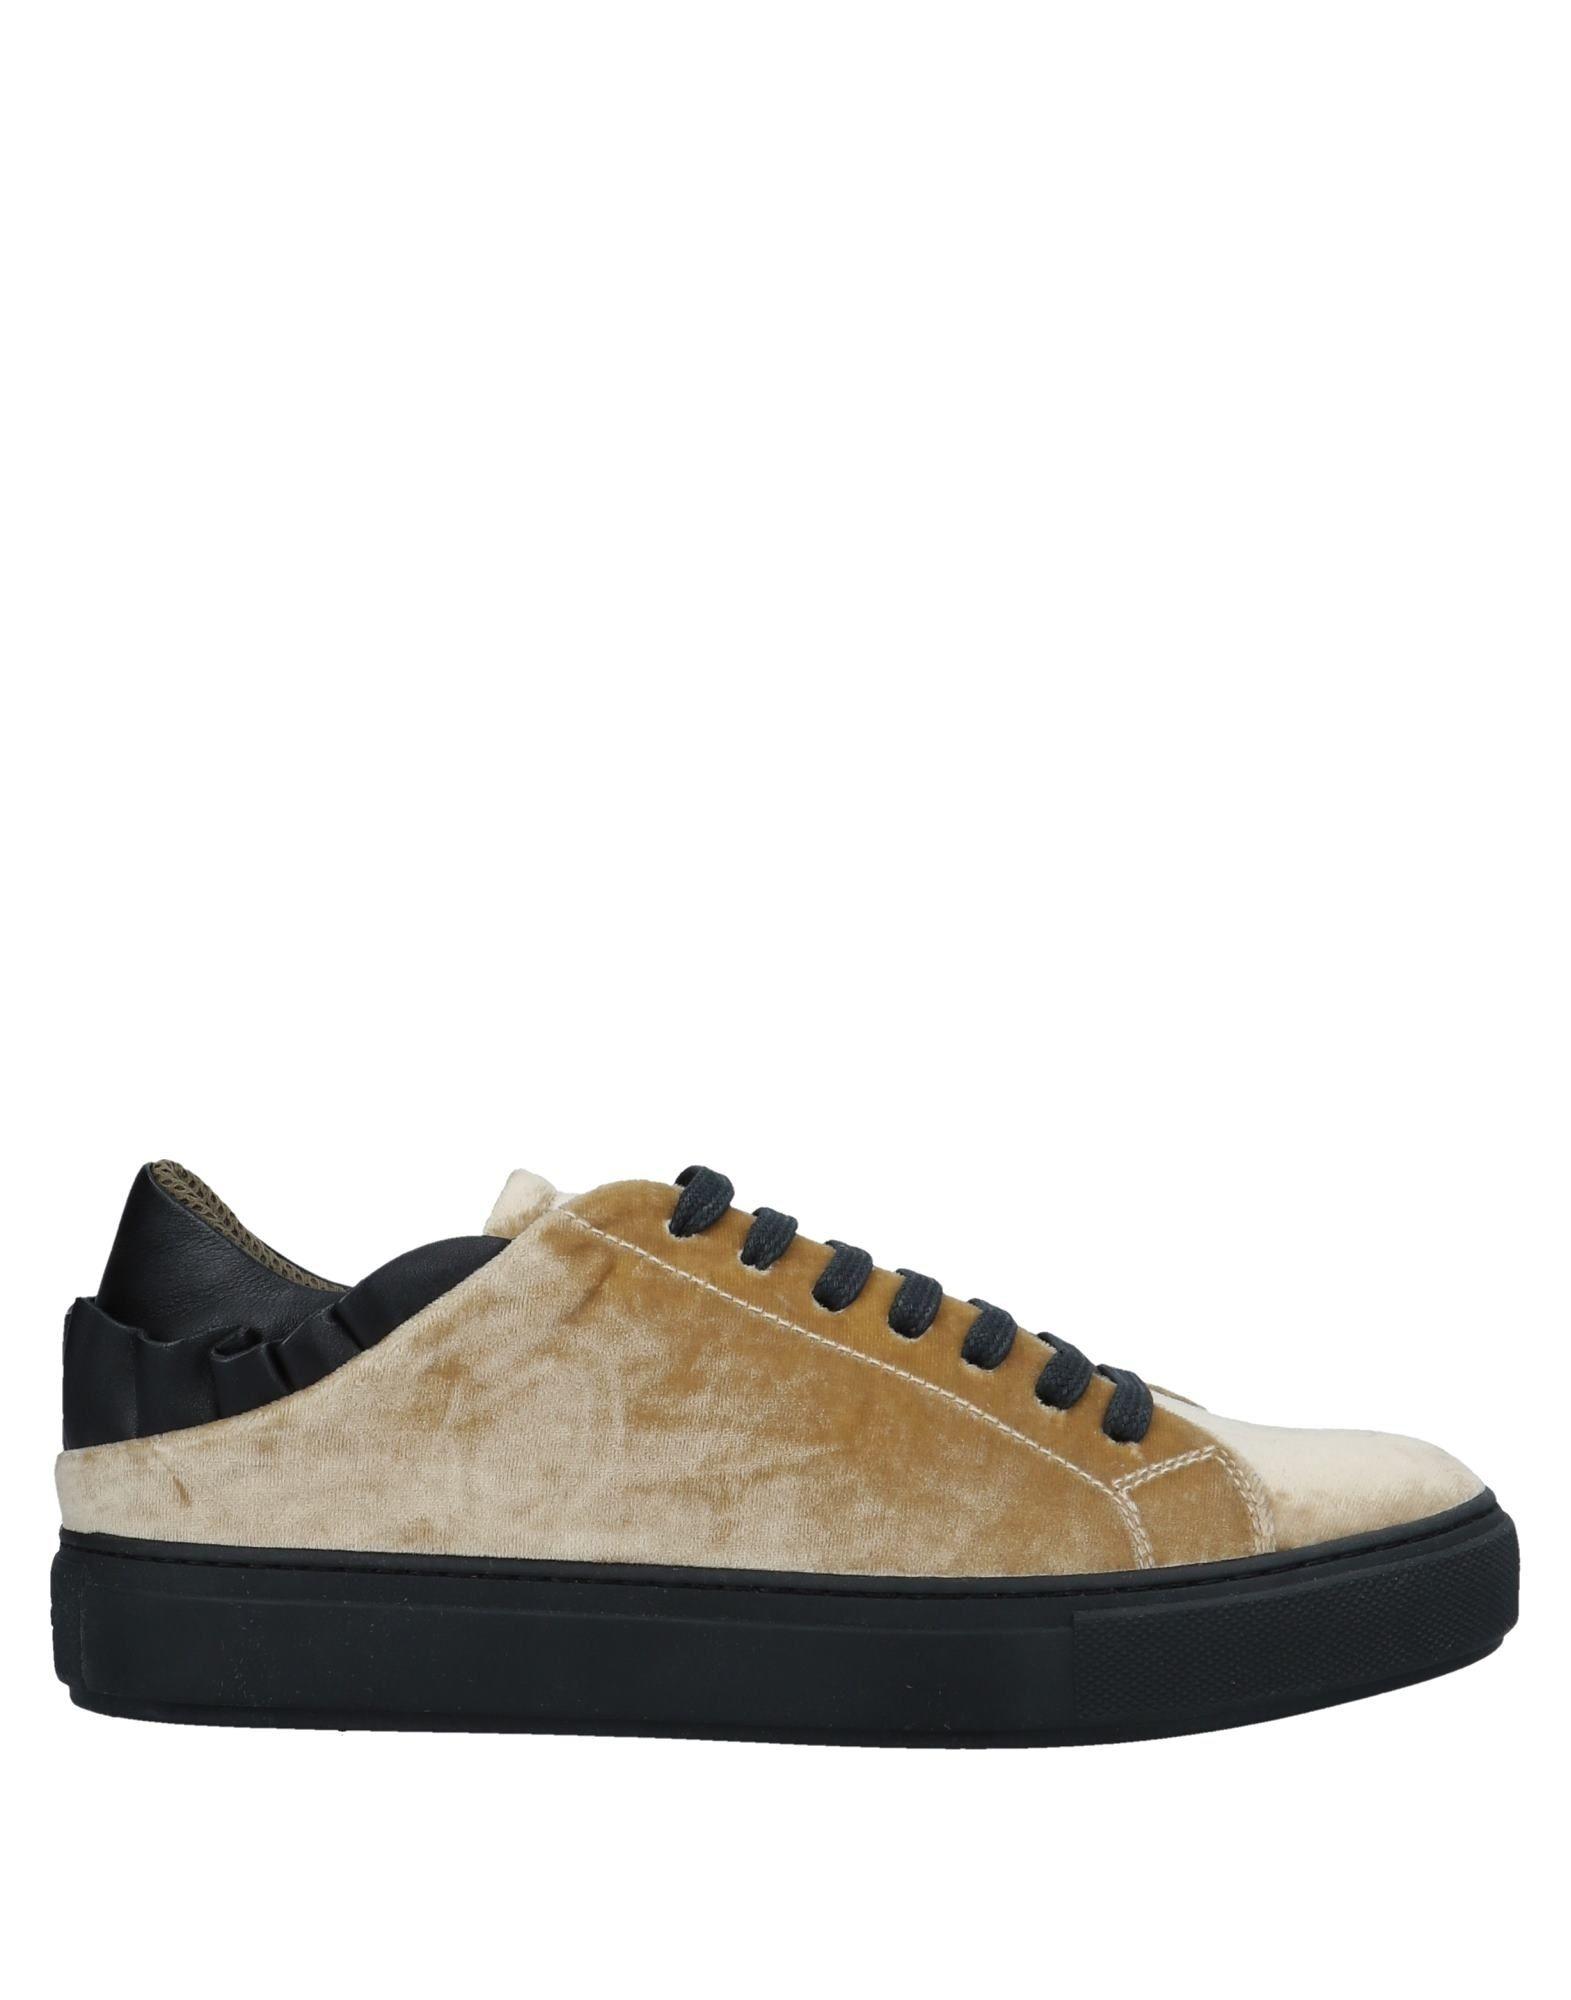 Pinko Sneakers - Women Pinko Canada Sneakers online on  Canada Pinko - 11547472XR 17c060